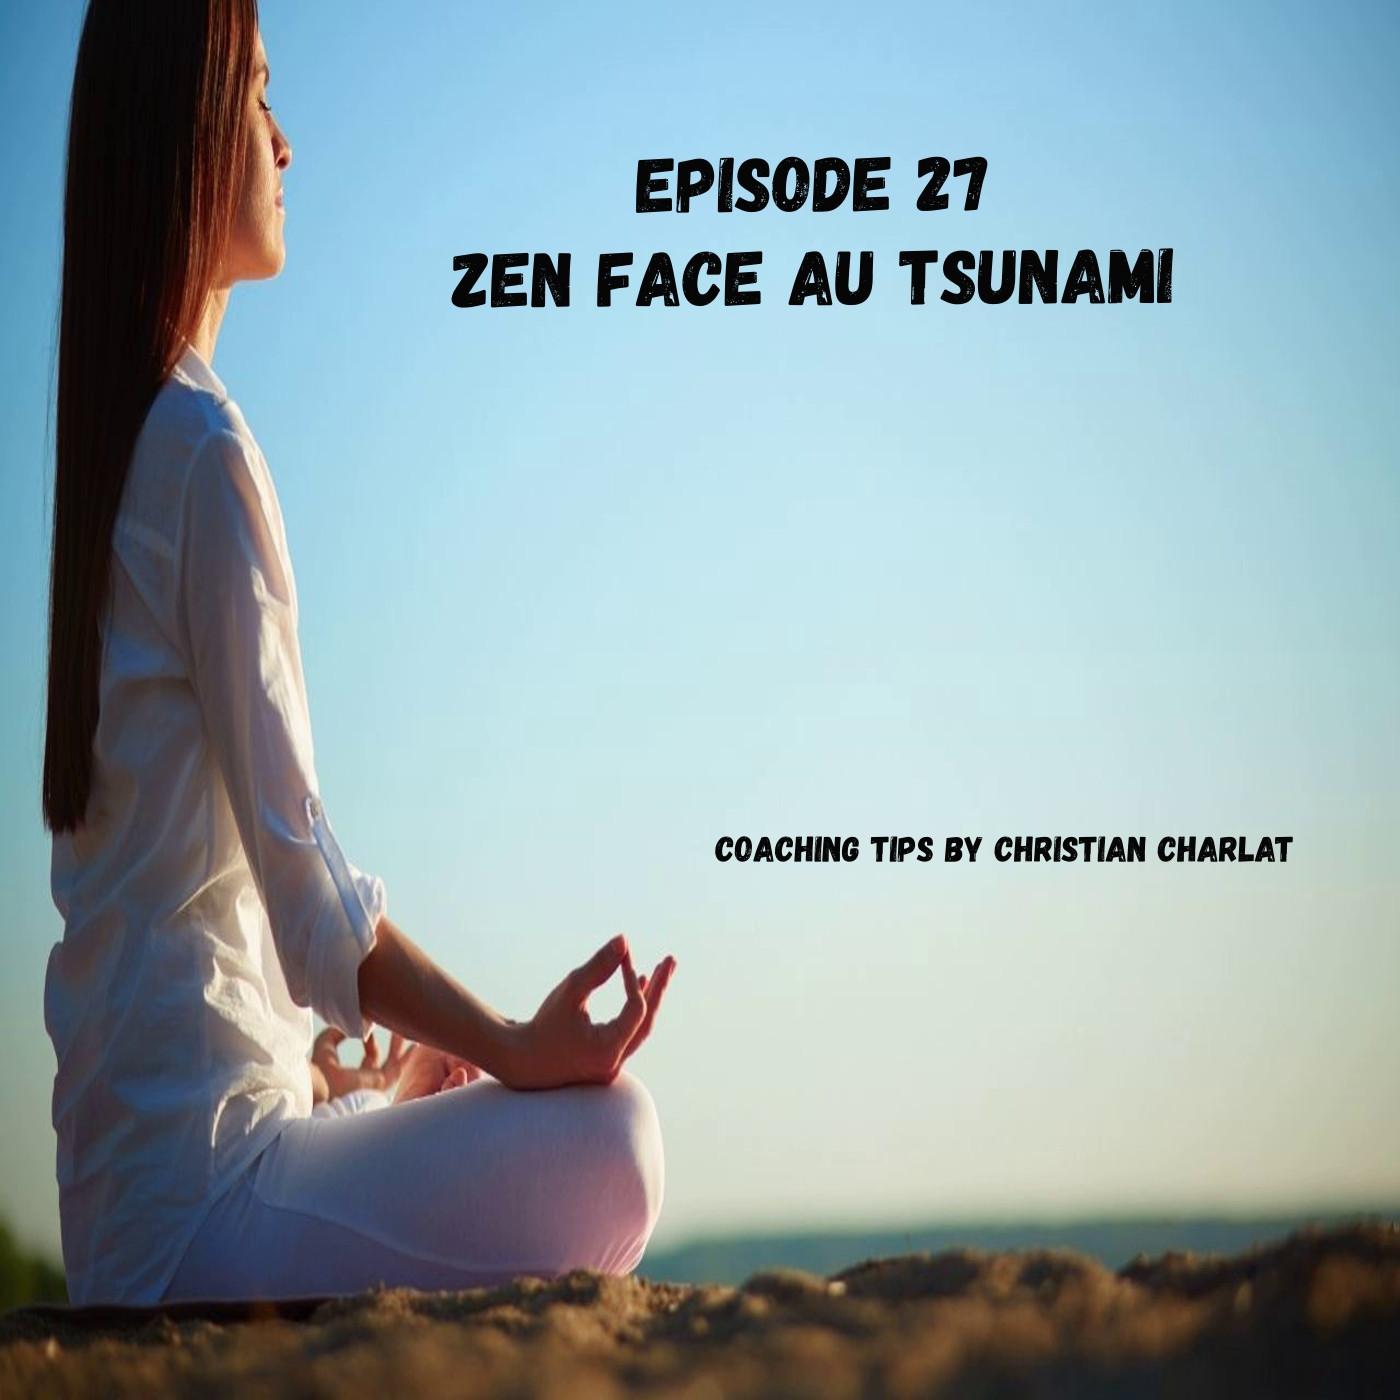 Episode 27 ZEN face au Tsunami